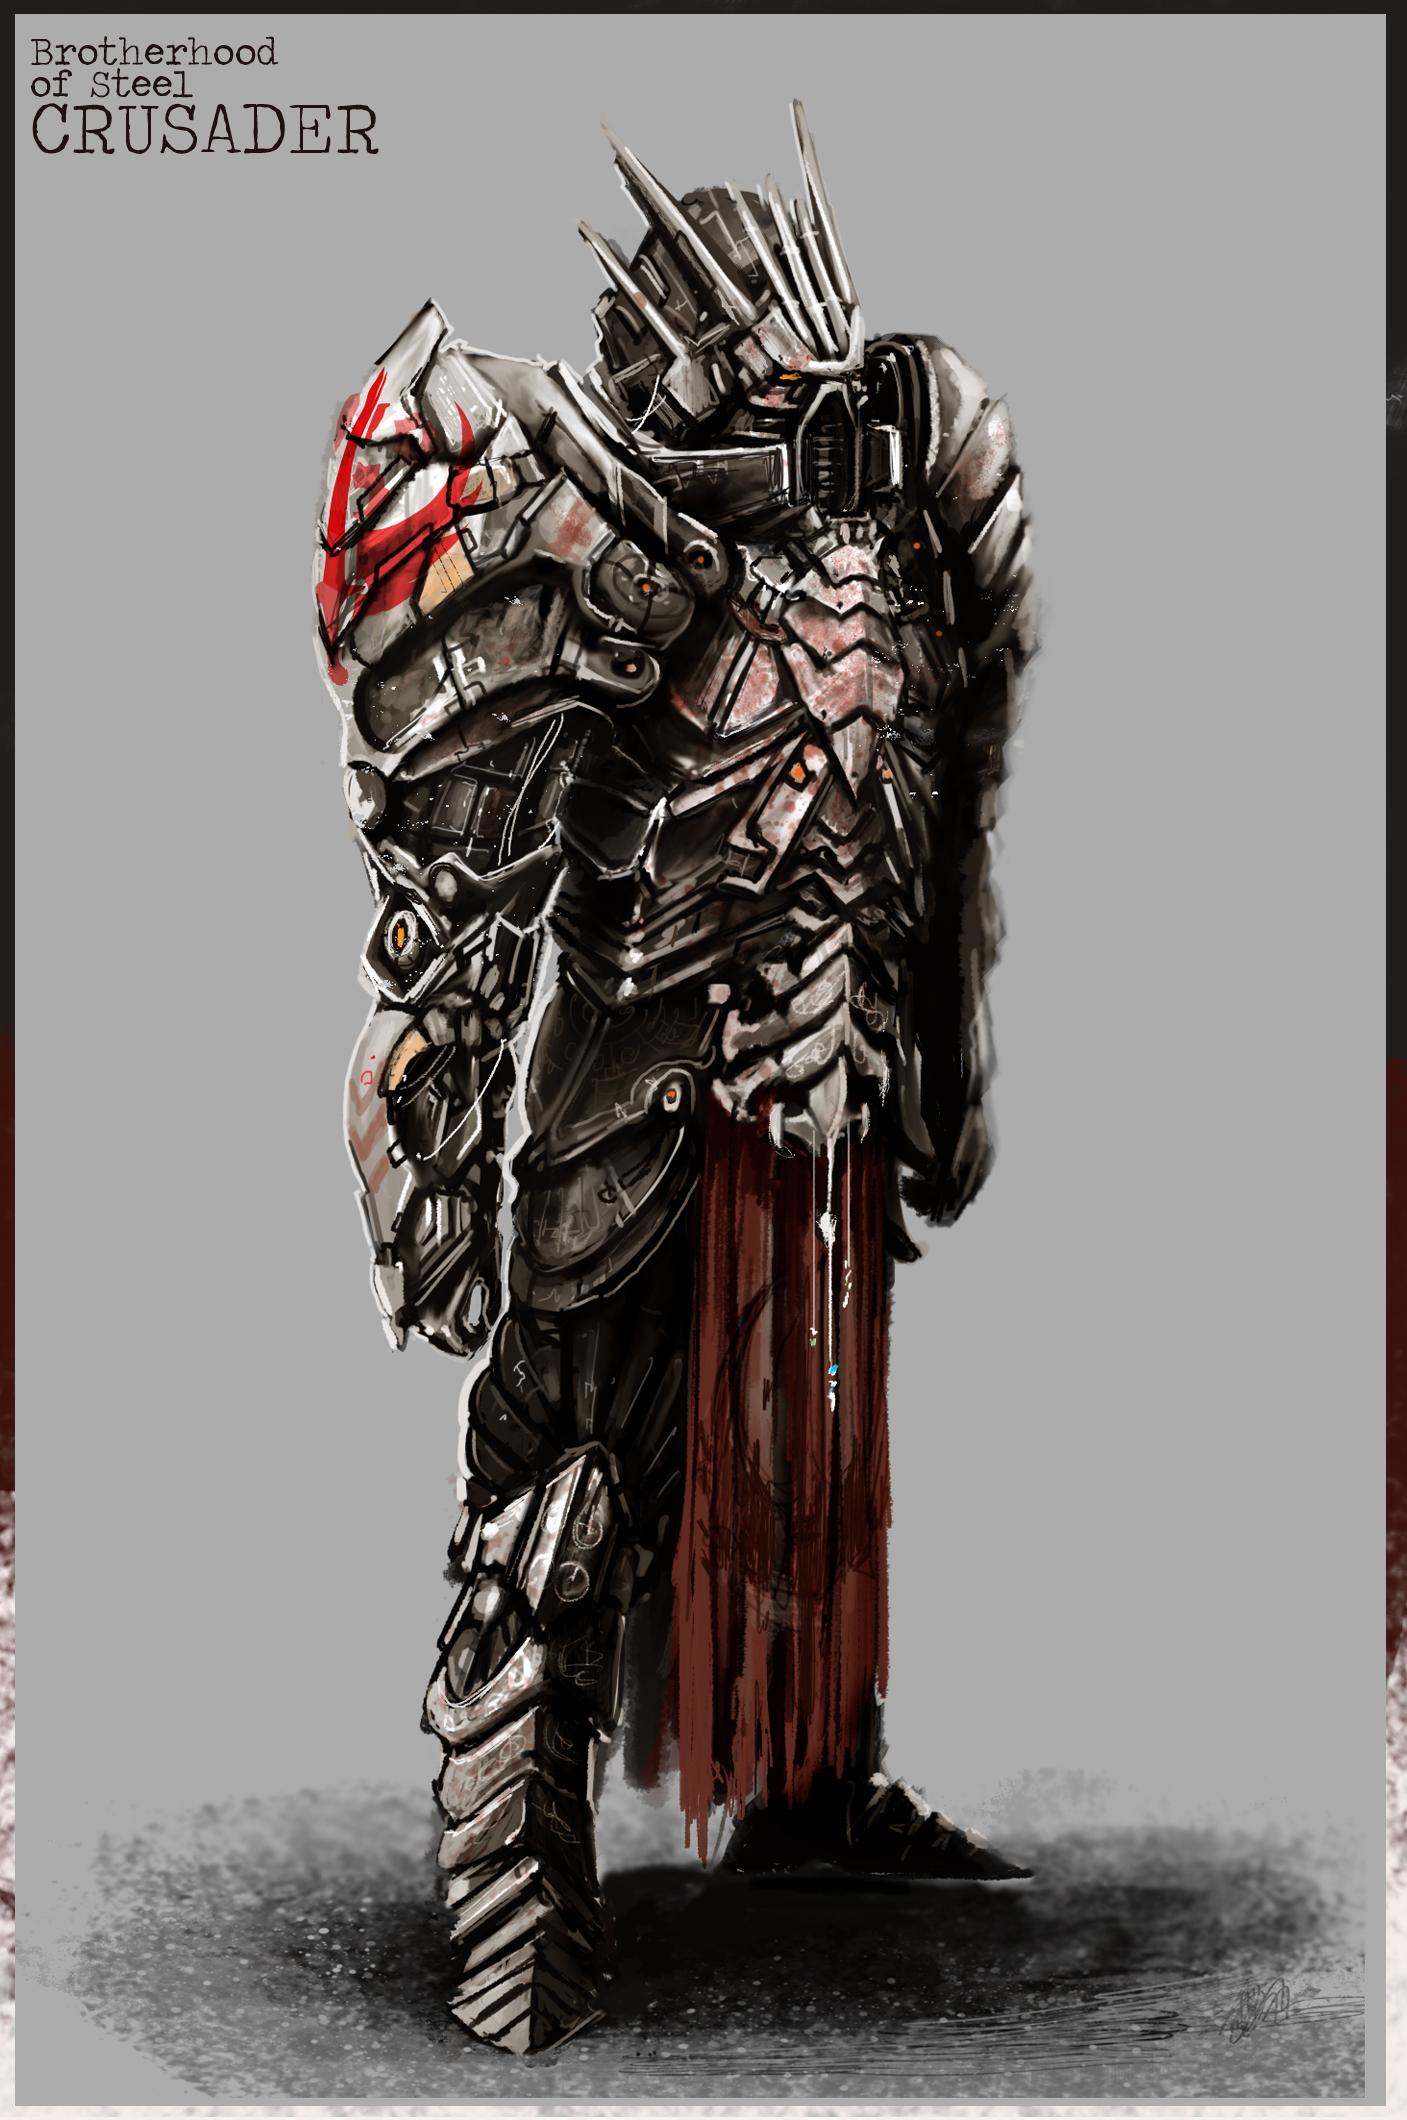 Brotherhood of Steel Crusader